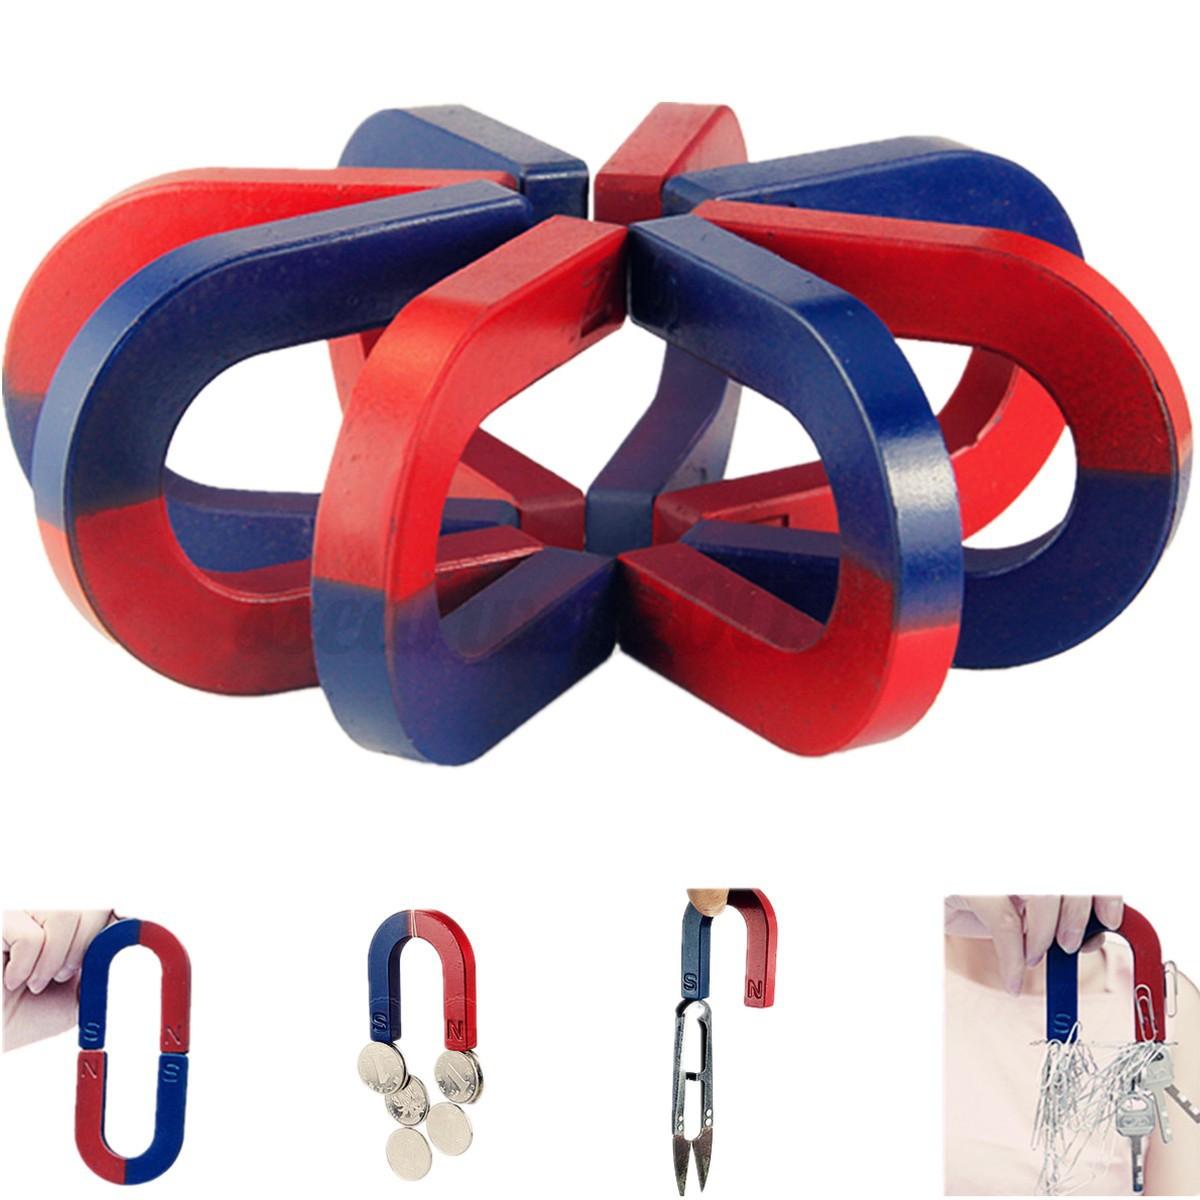 Traditional mini u shaped horseshoe magnet kids toy